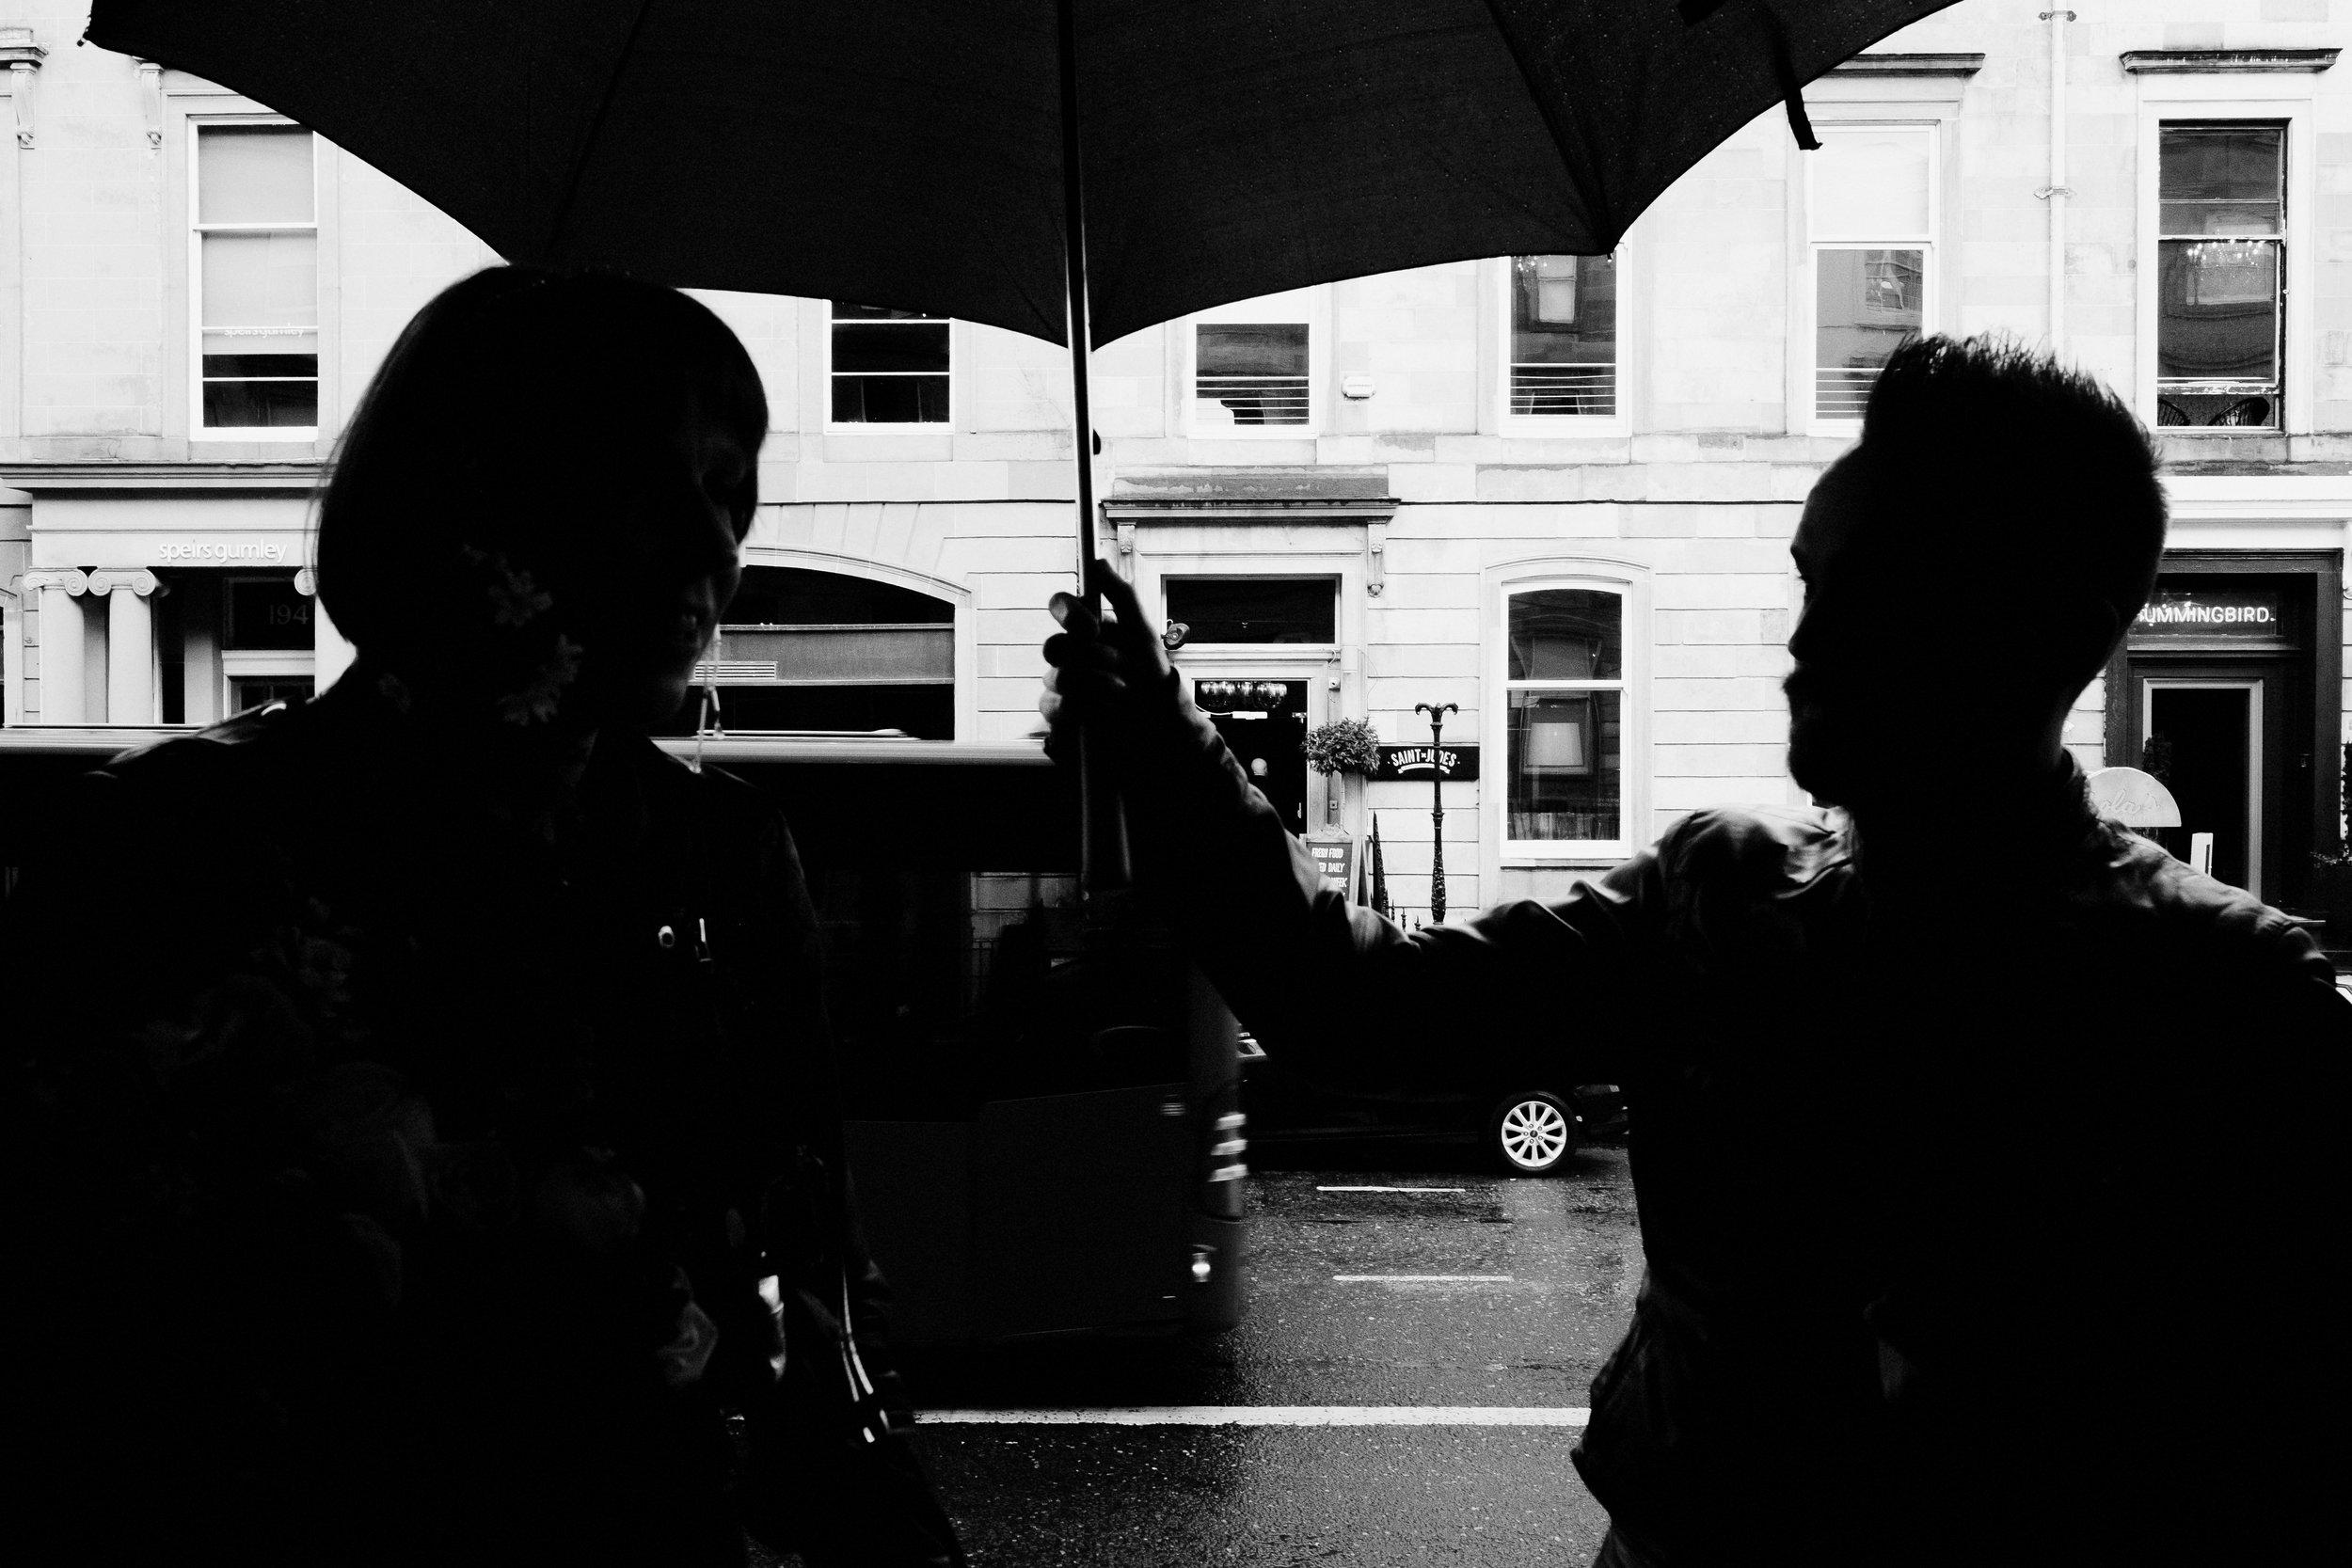 Silhouette of couple under umbrella